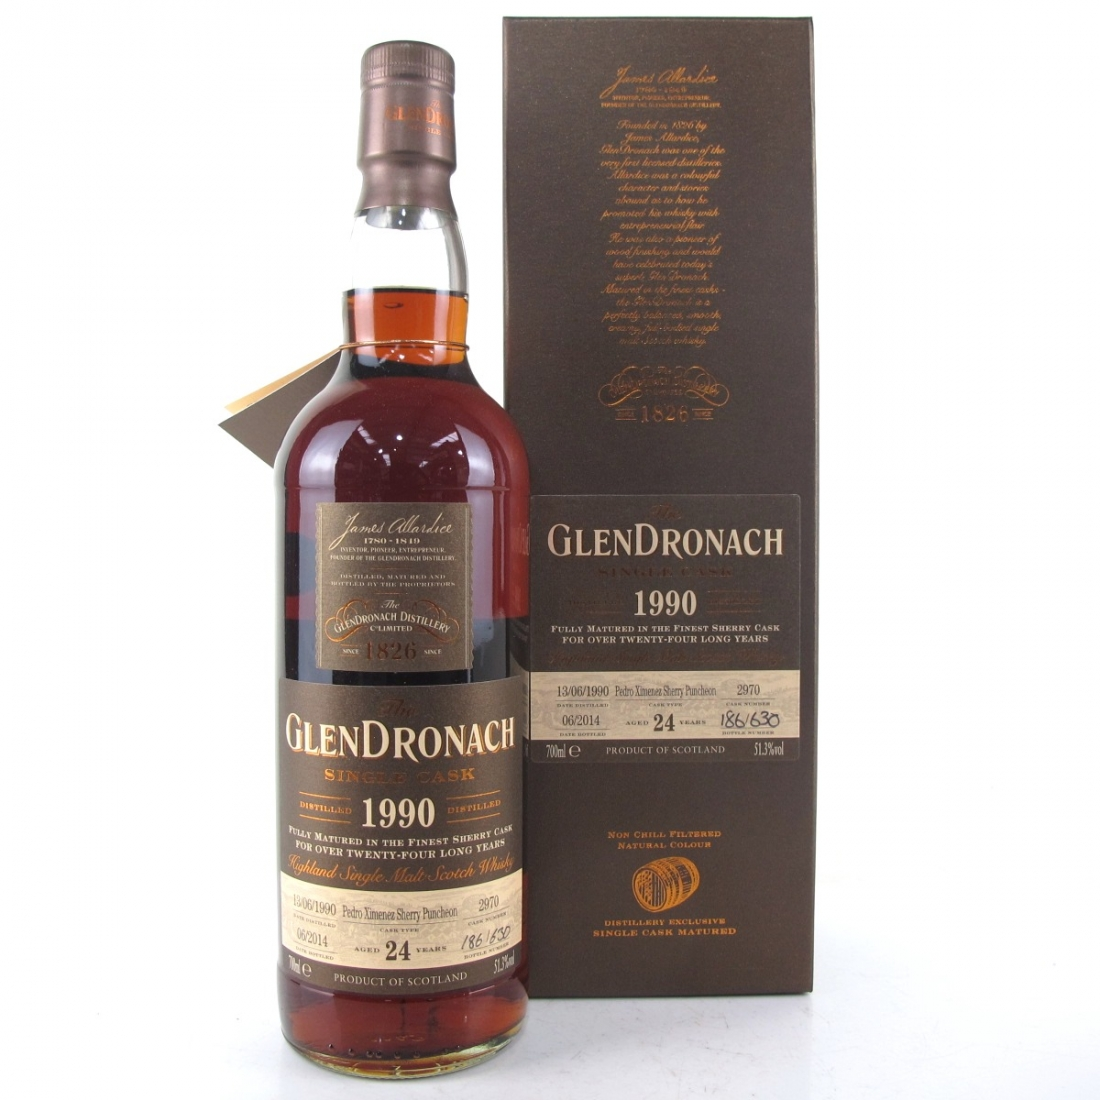 Glendronach 1990 Single Cask 24 Year Old #2970